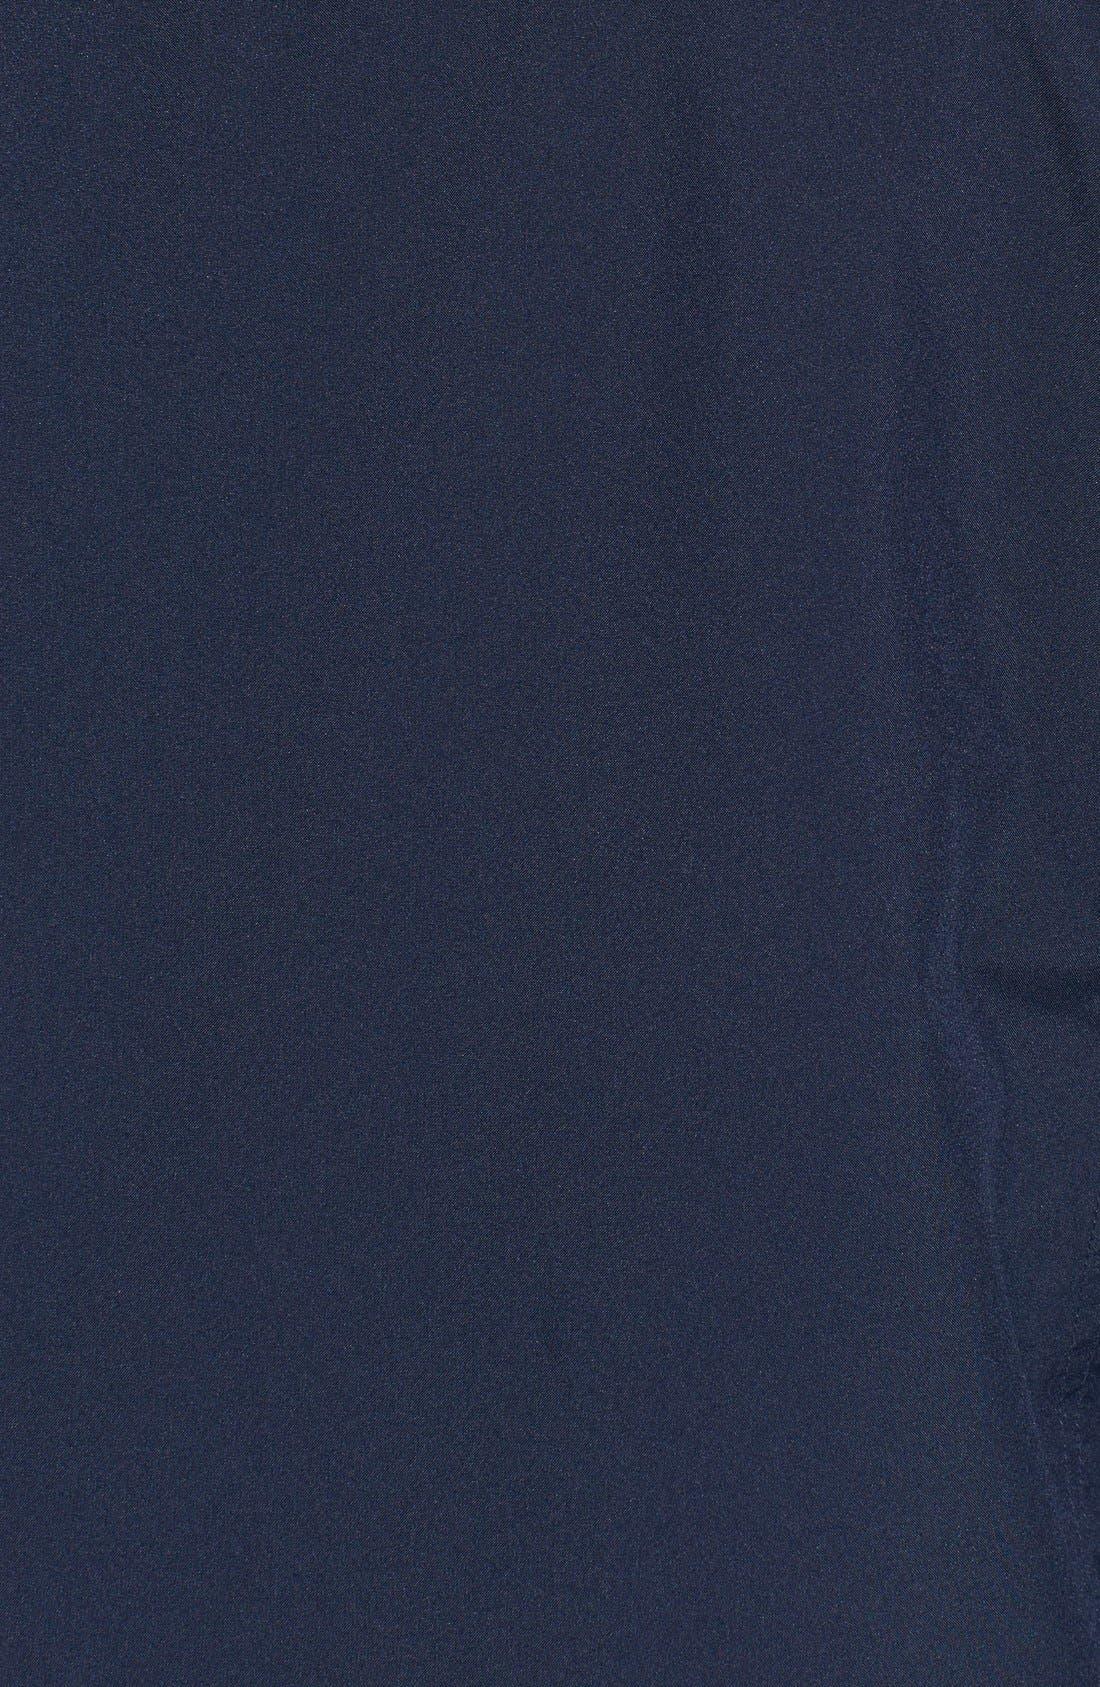 CUTTER & BUCK,                             WeatherTec Sanders Jacket,                             Alternate thumbnail 3, color,                             420